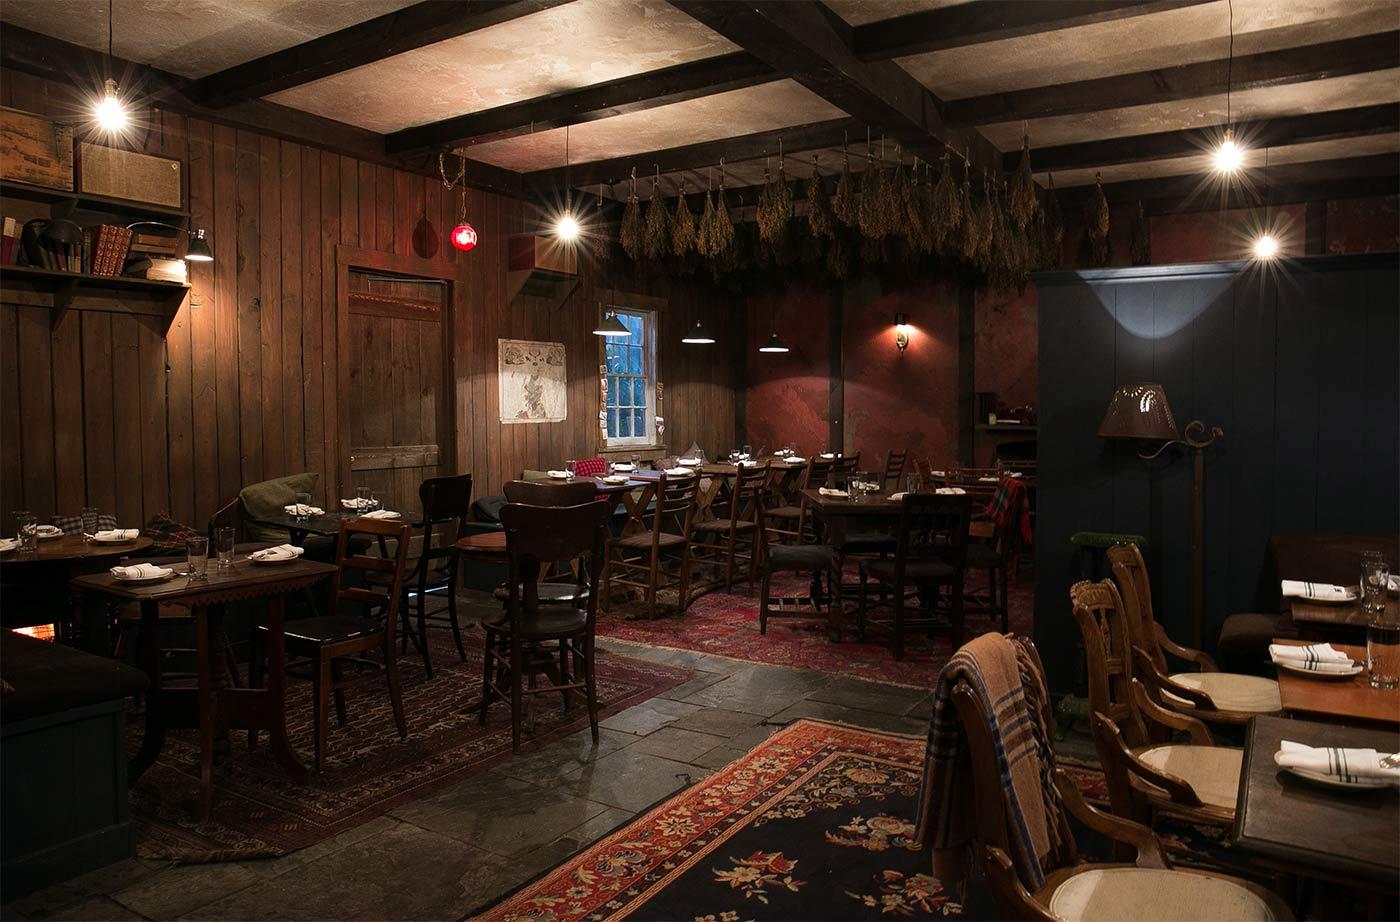 The-Lodge-Main-Dining-Room-1_Conor-Harrigan-11.jpg